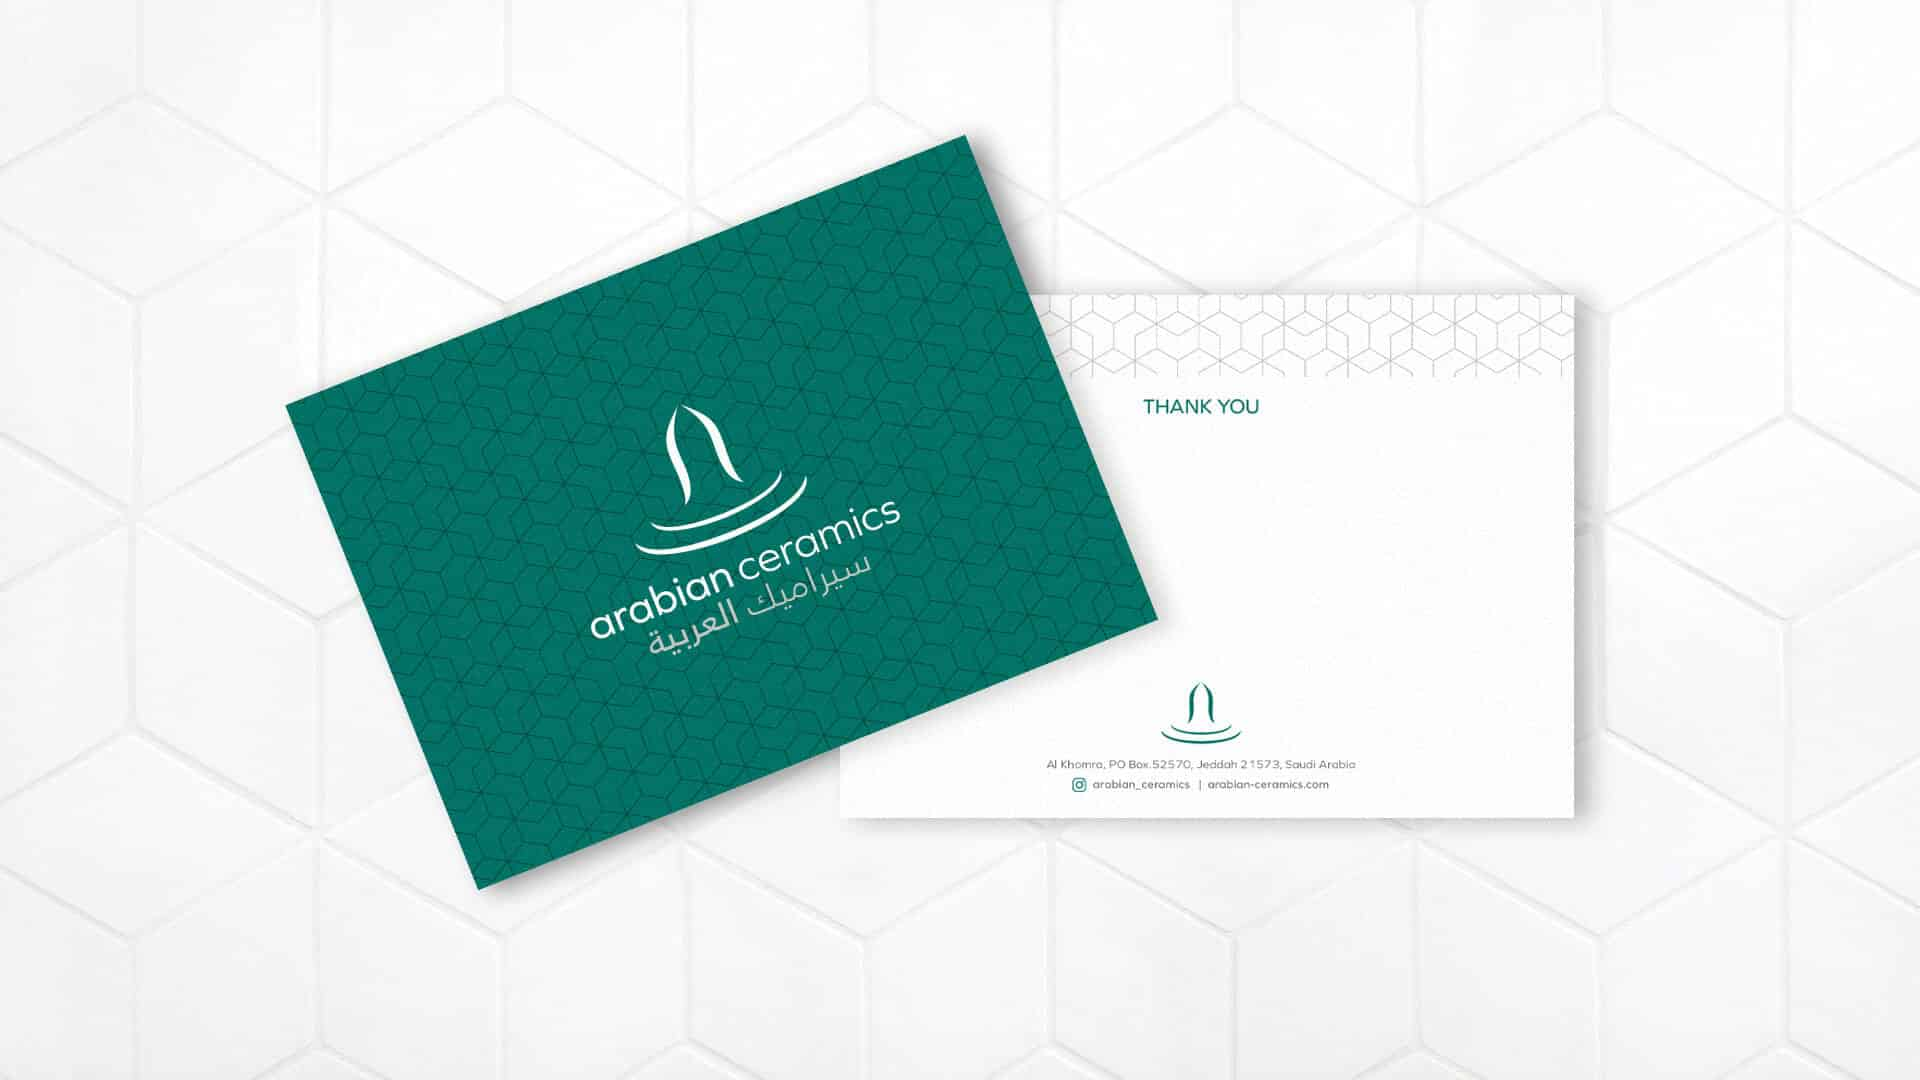 Saudi Arabia based Arabian Ceramics packing and compliments slip design